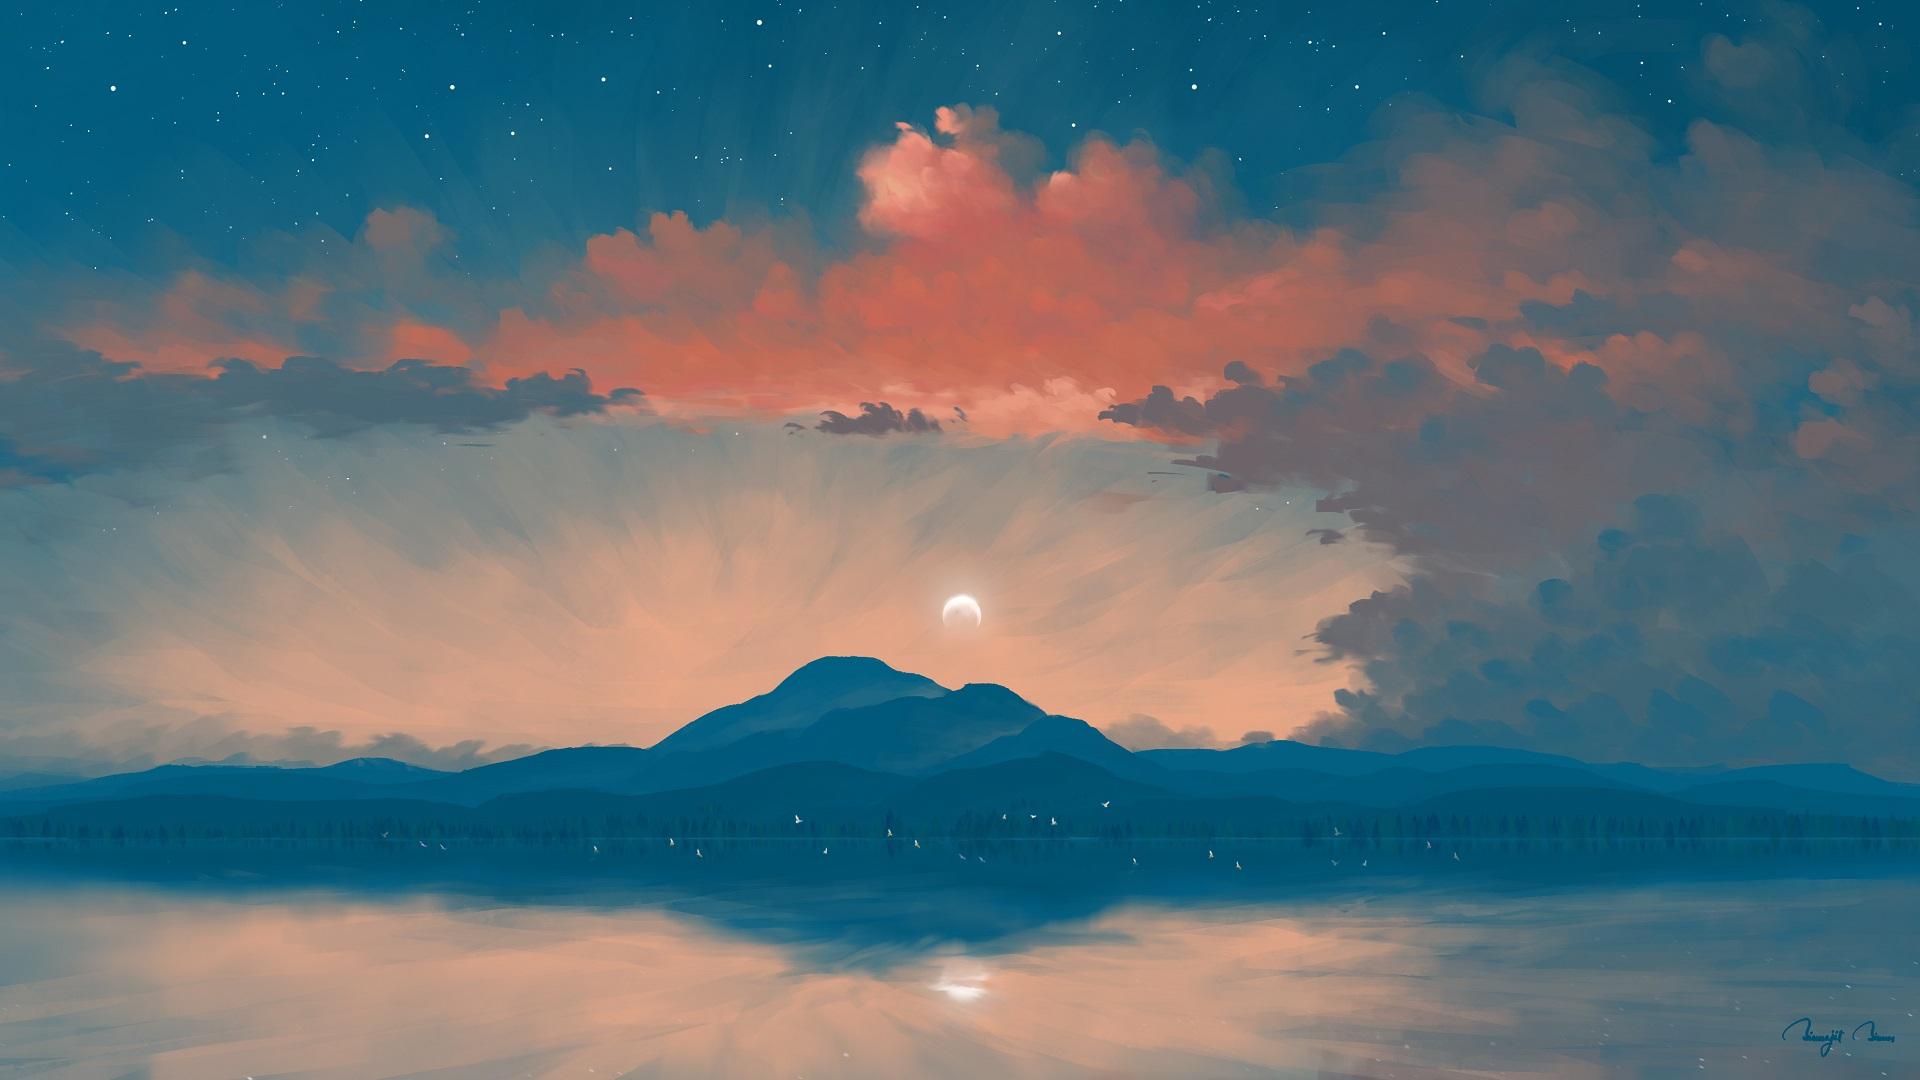 General 1920x1080 digital painting landscape sunrise lake mountains sky clouds BisBiswas